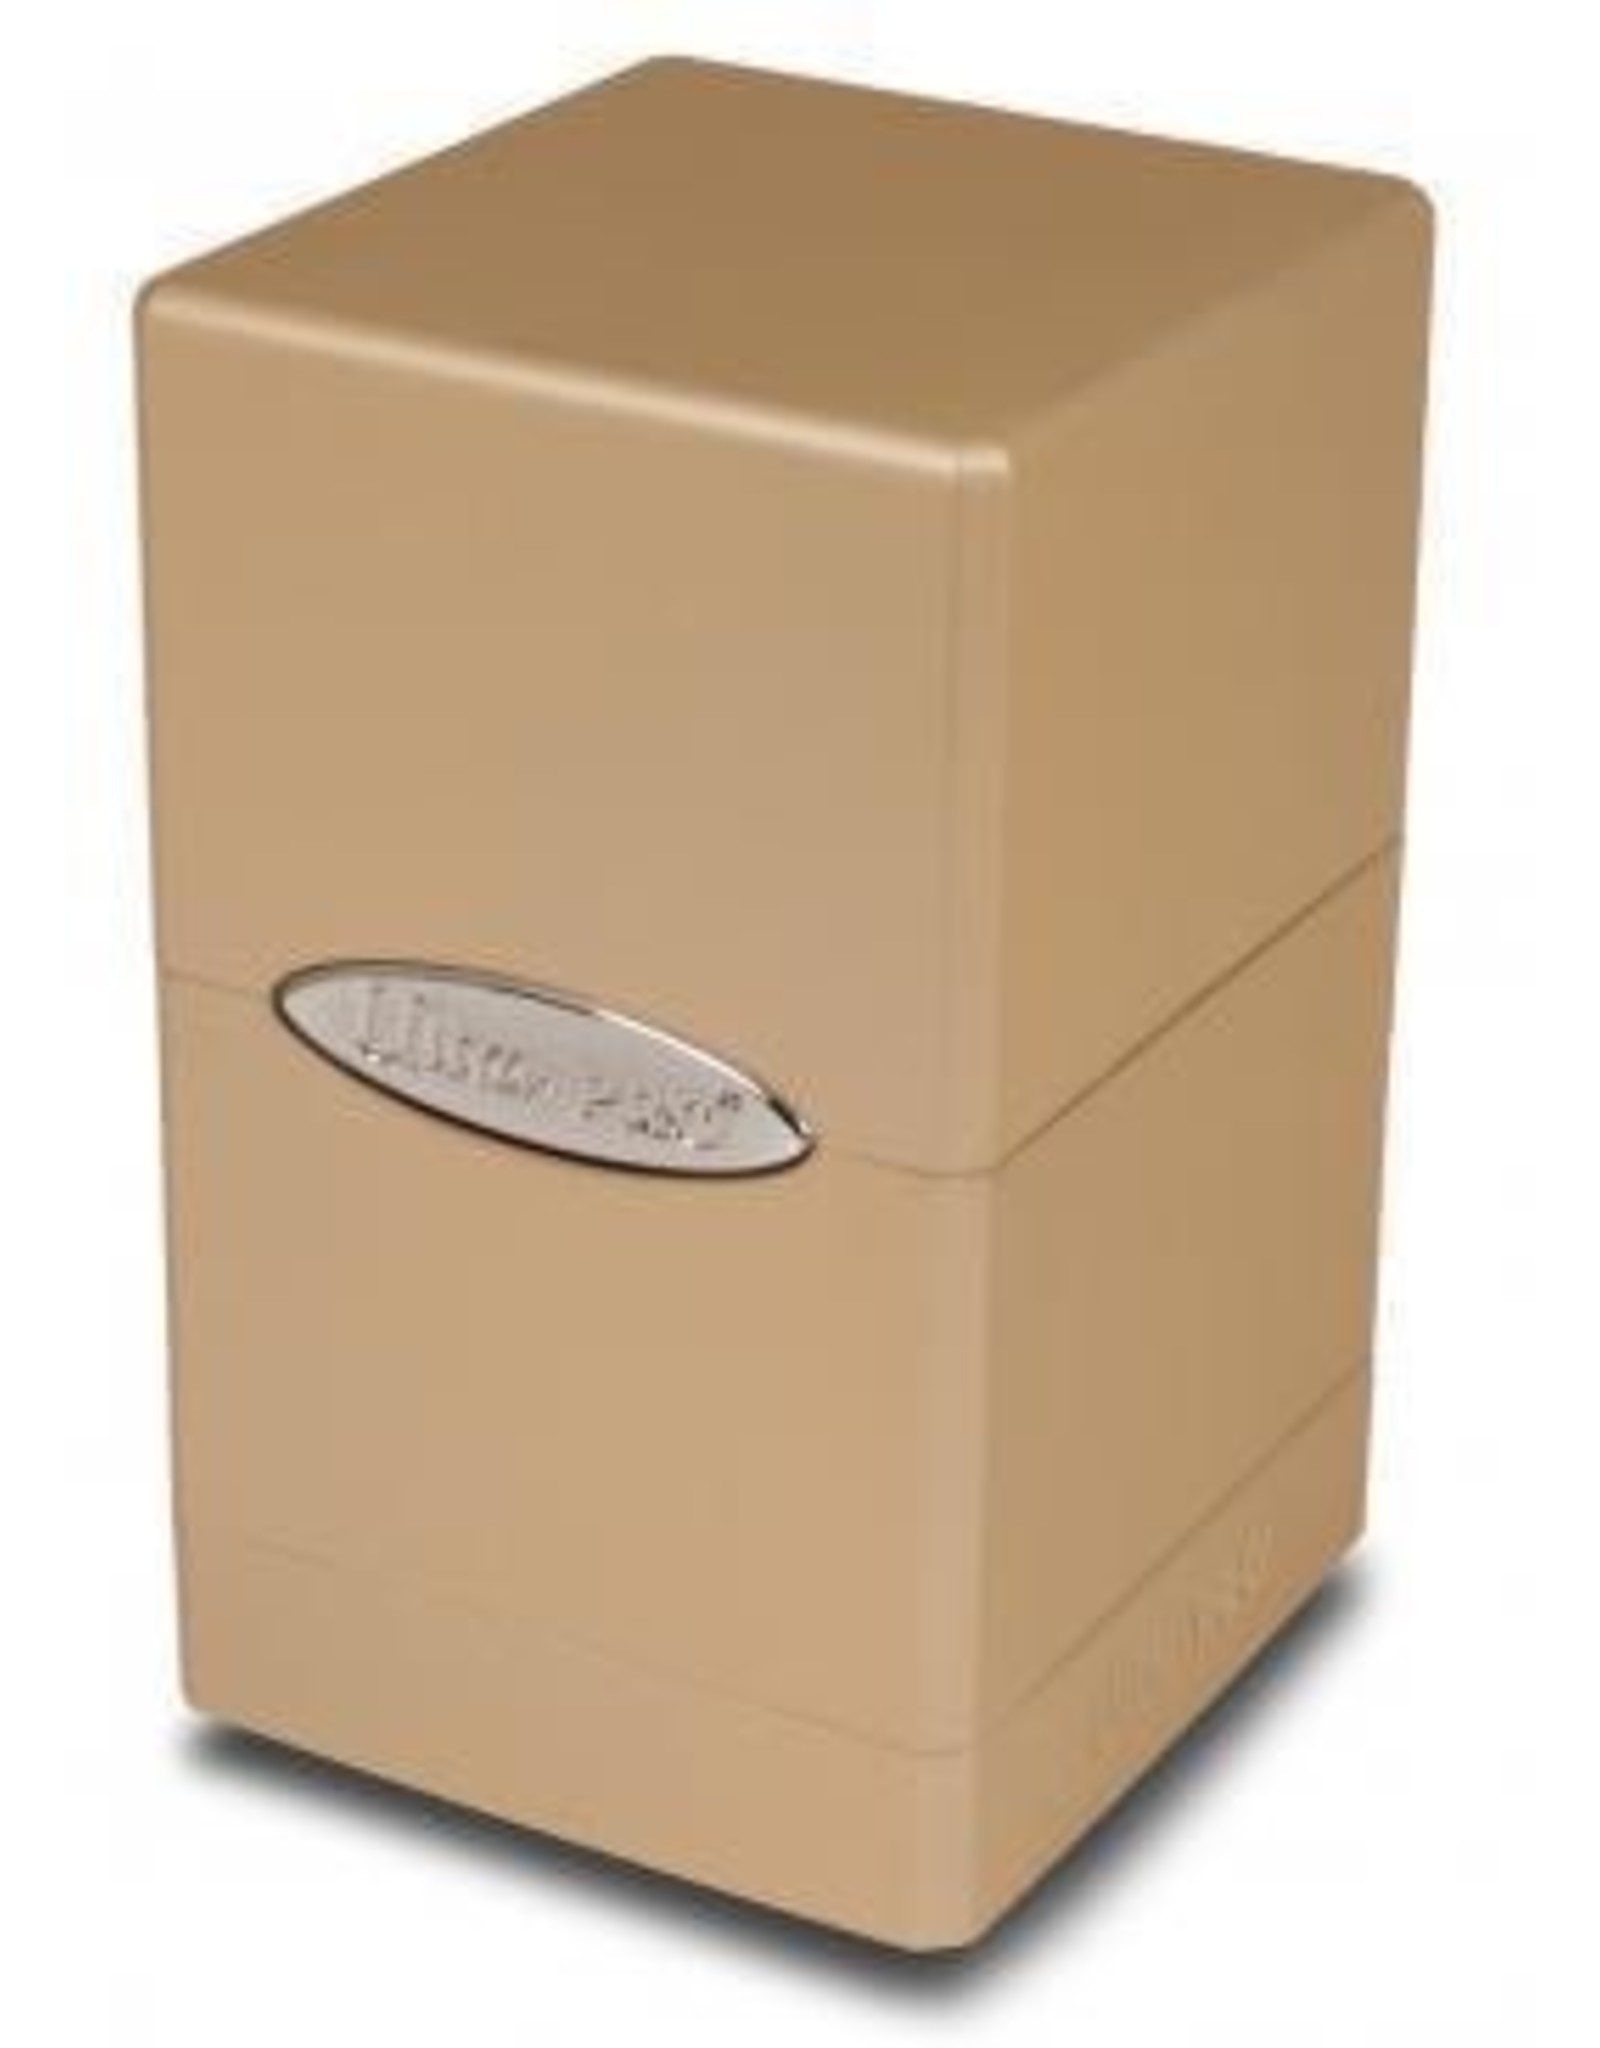 Ultra Pro Satin Tower Deck Box Metallic Caramel